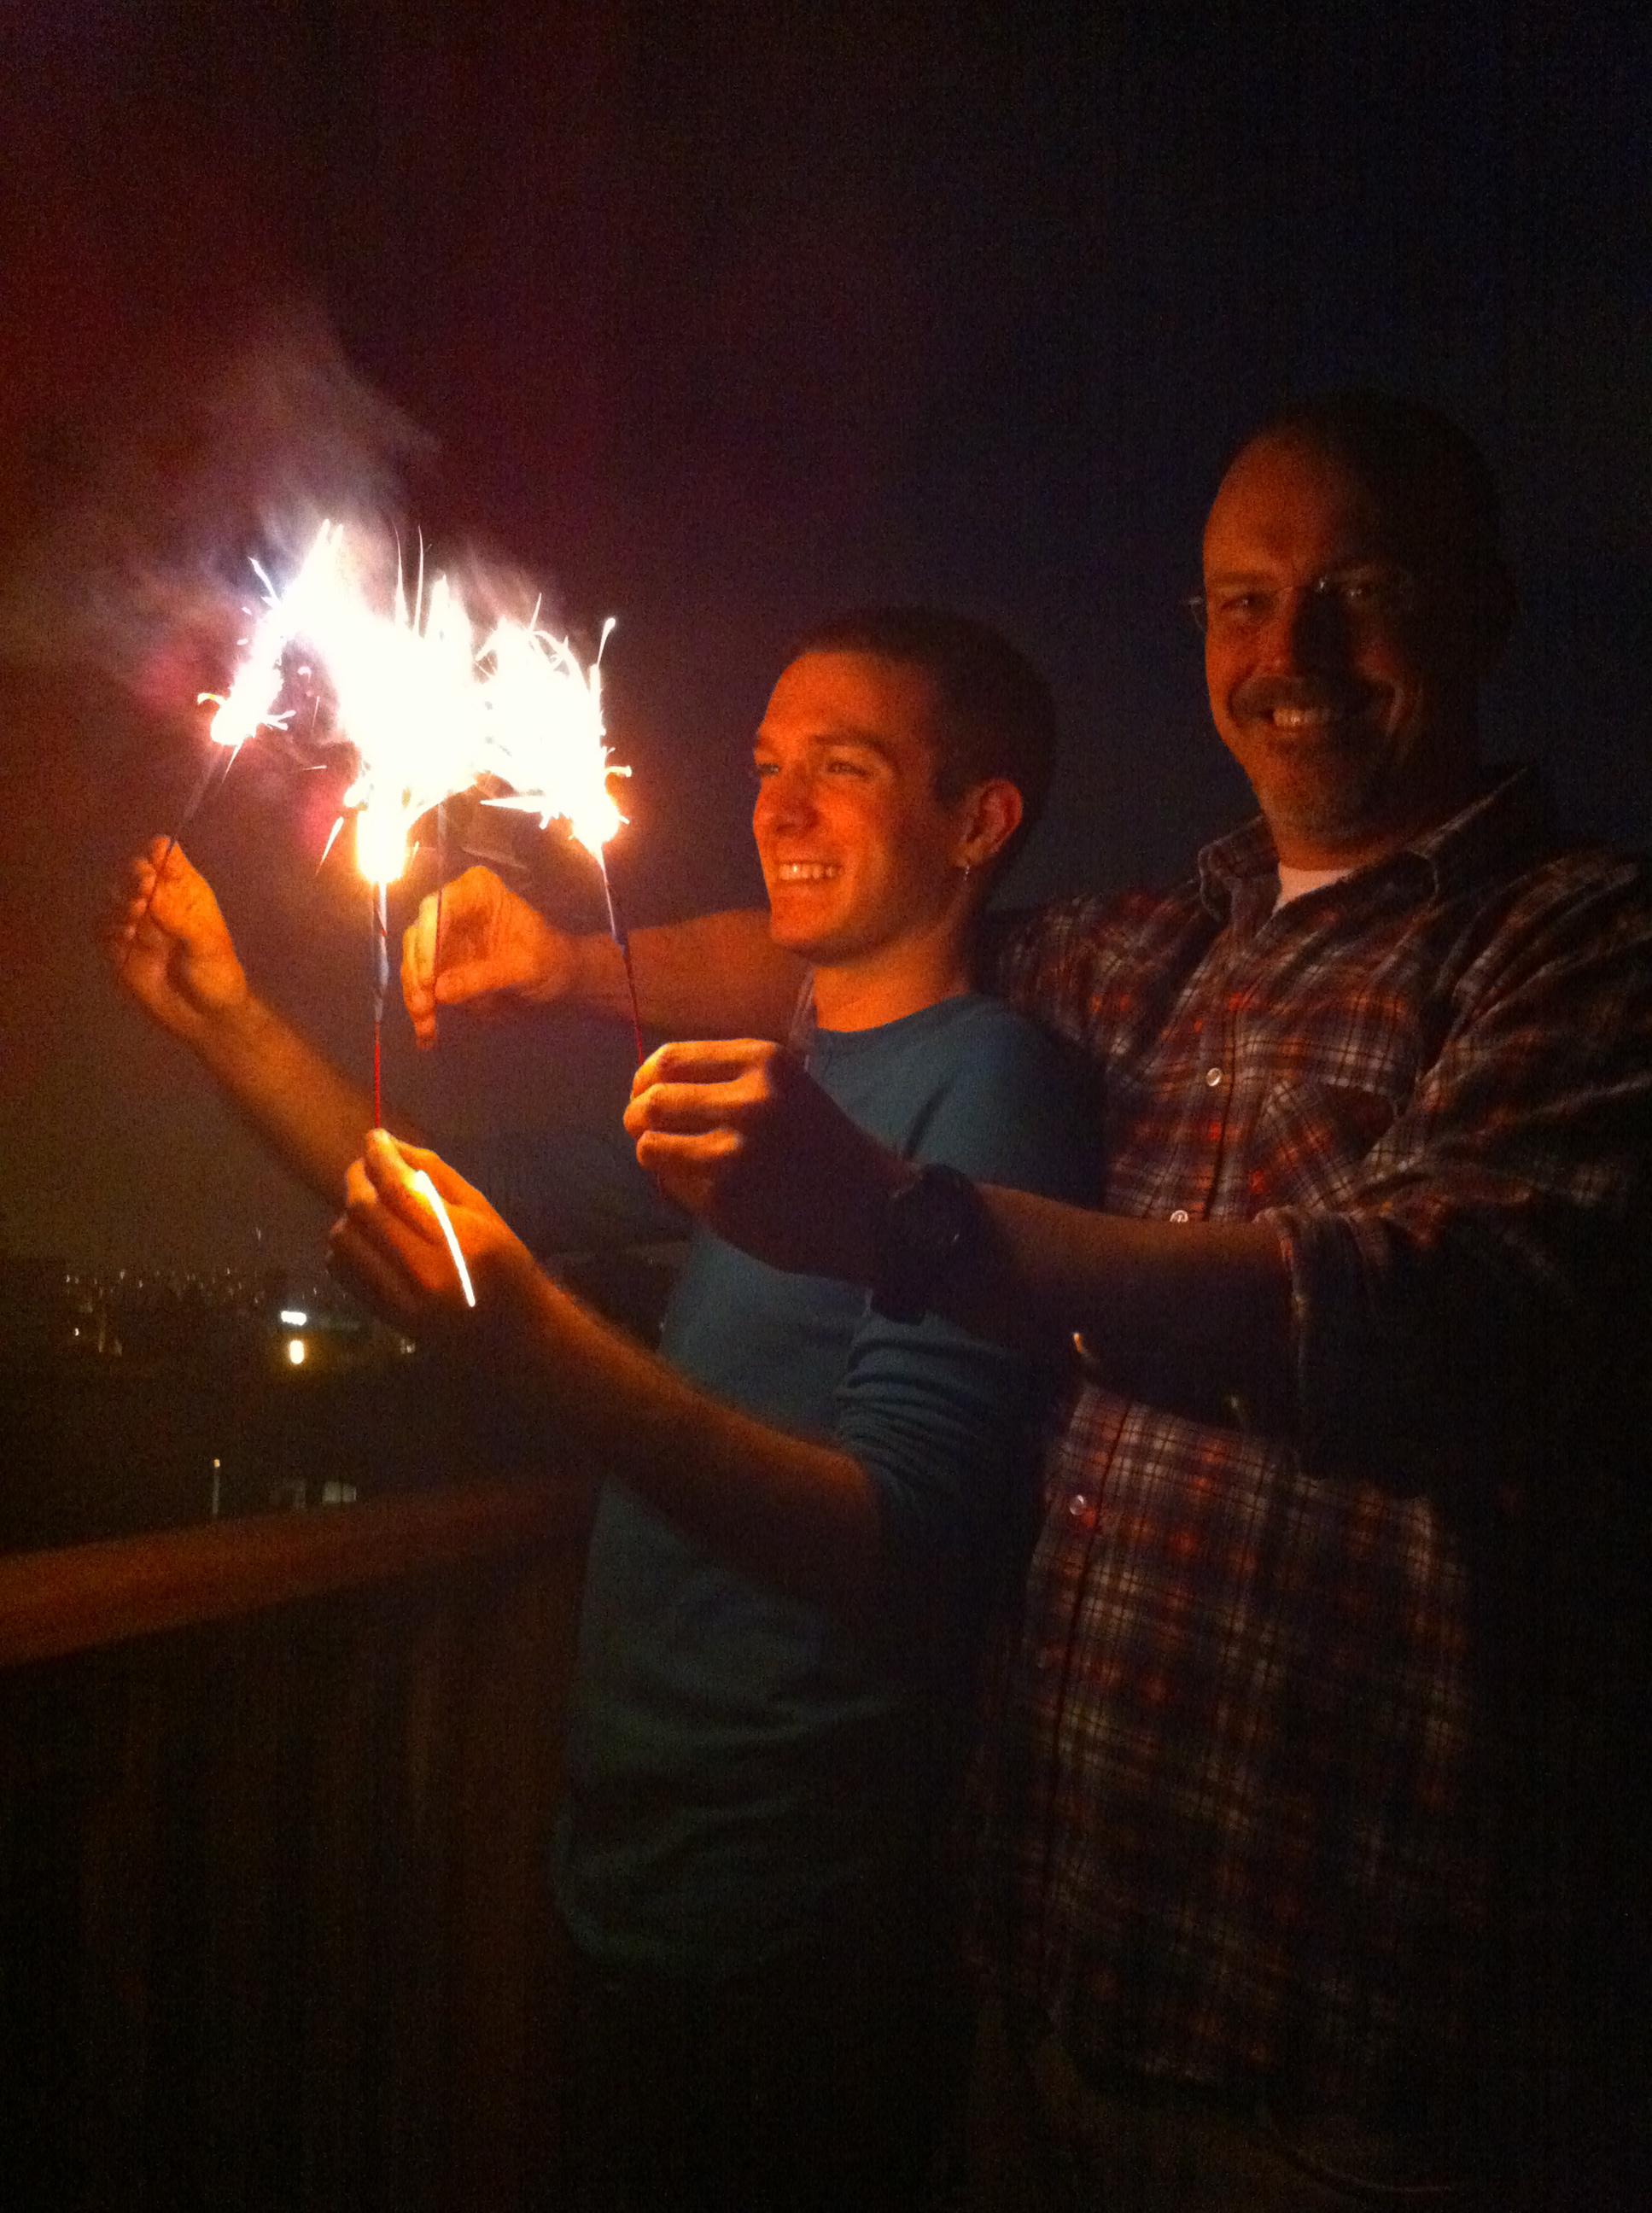 Jonathan Nye and Matthew Sachs fly their sparklers